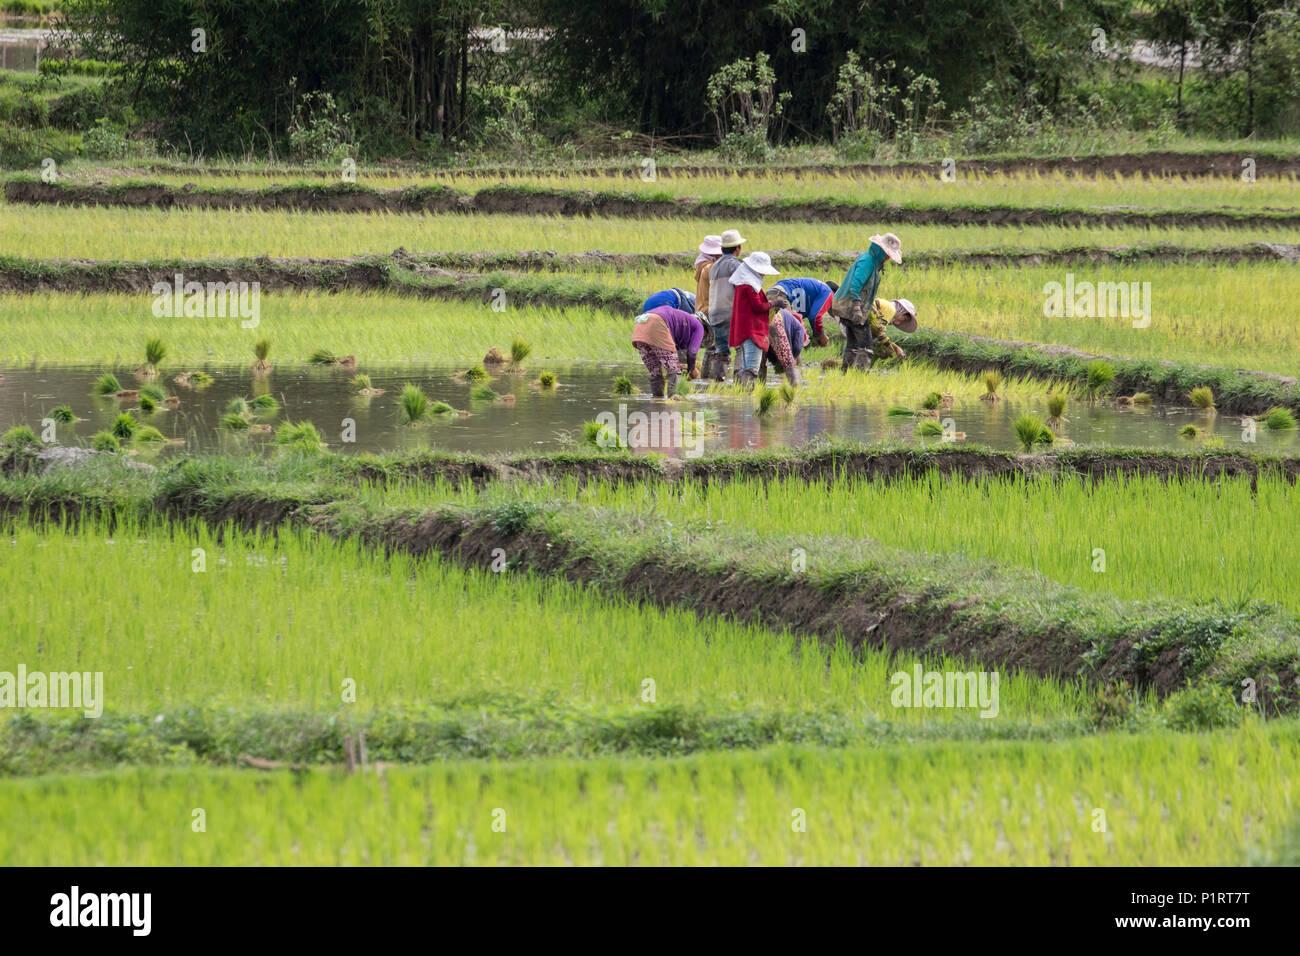 People planting rice in fields near Phonsavan; Xiangkhouang, Laos - Stock Image